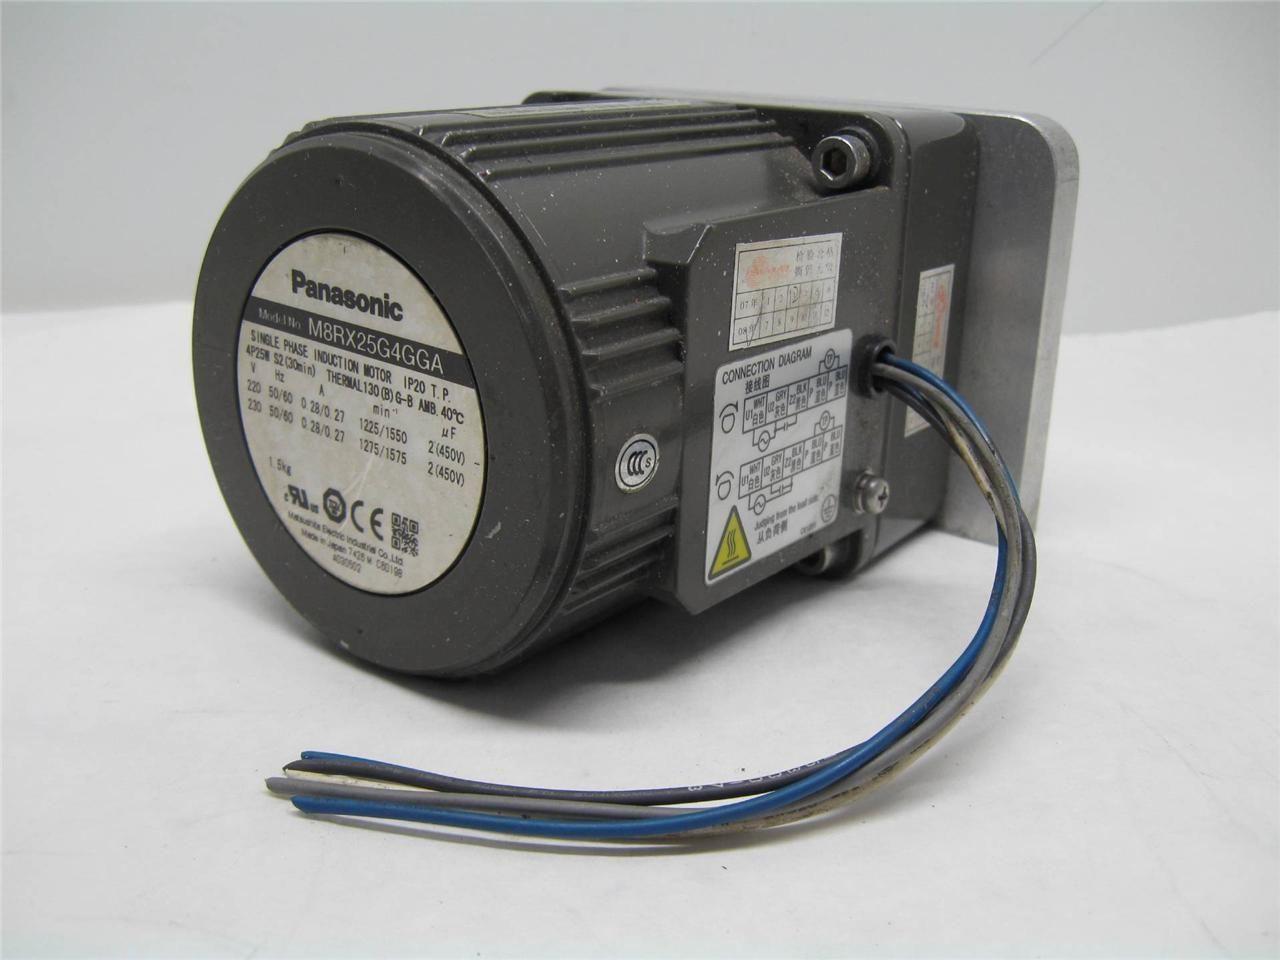 Panasonic M8rx25g4gga Single Phase Induction Motor Other Electric Motors